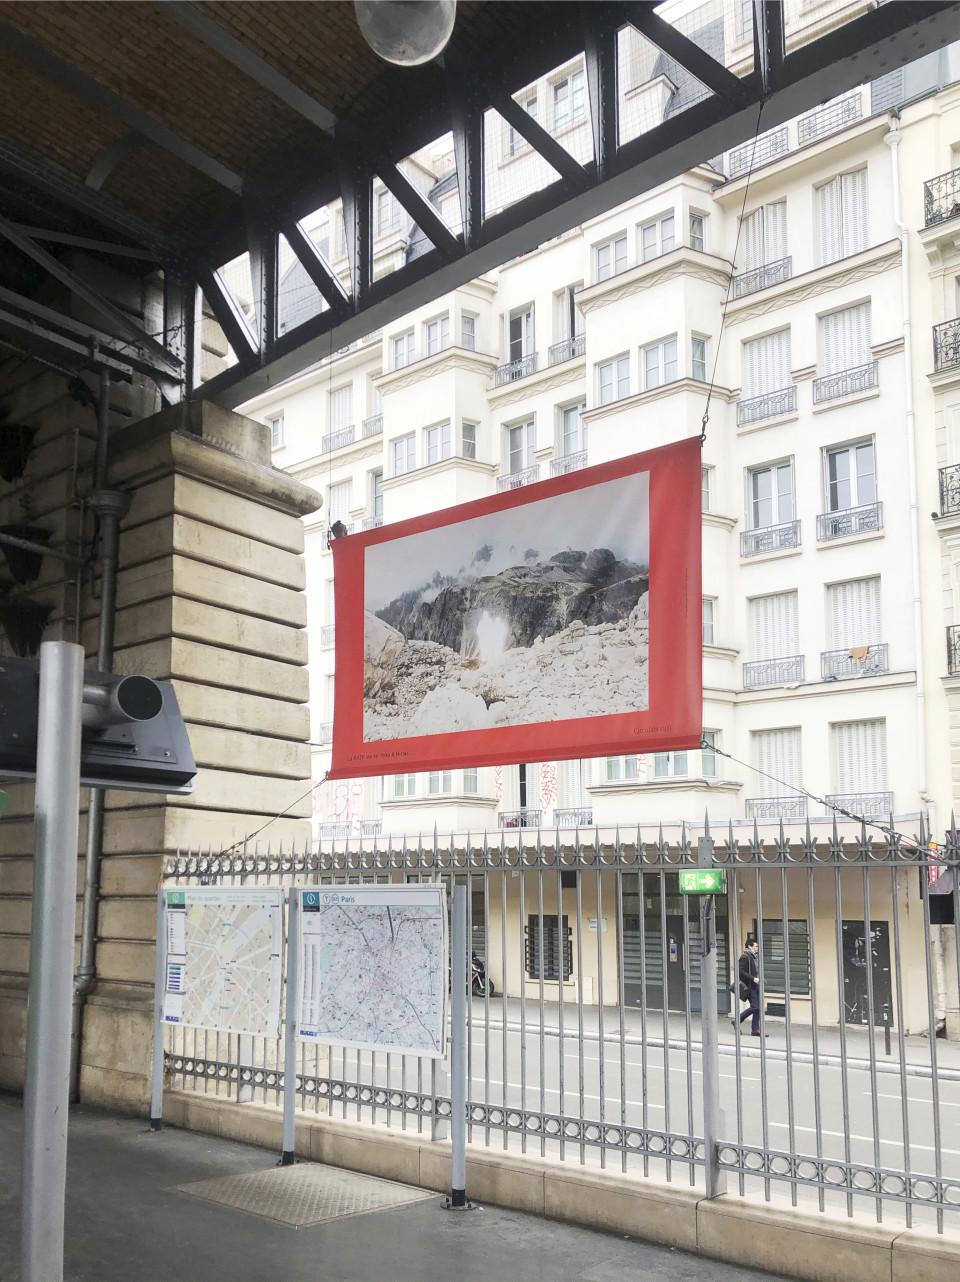 Presenting works in 11 Metro stations in Paris, France, 2021